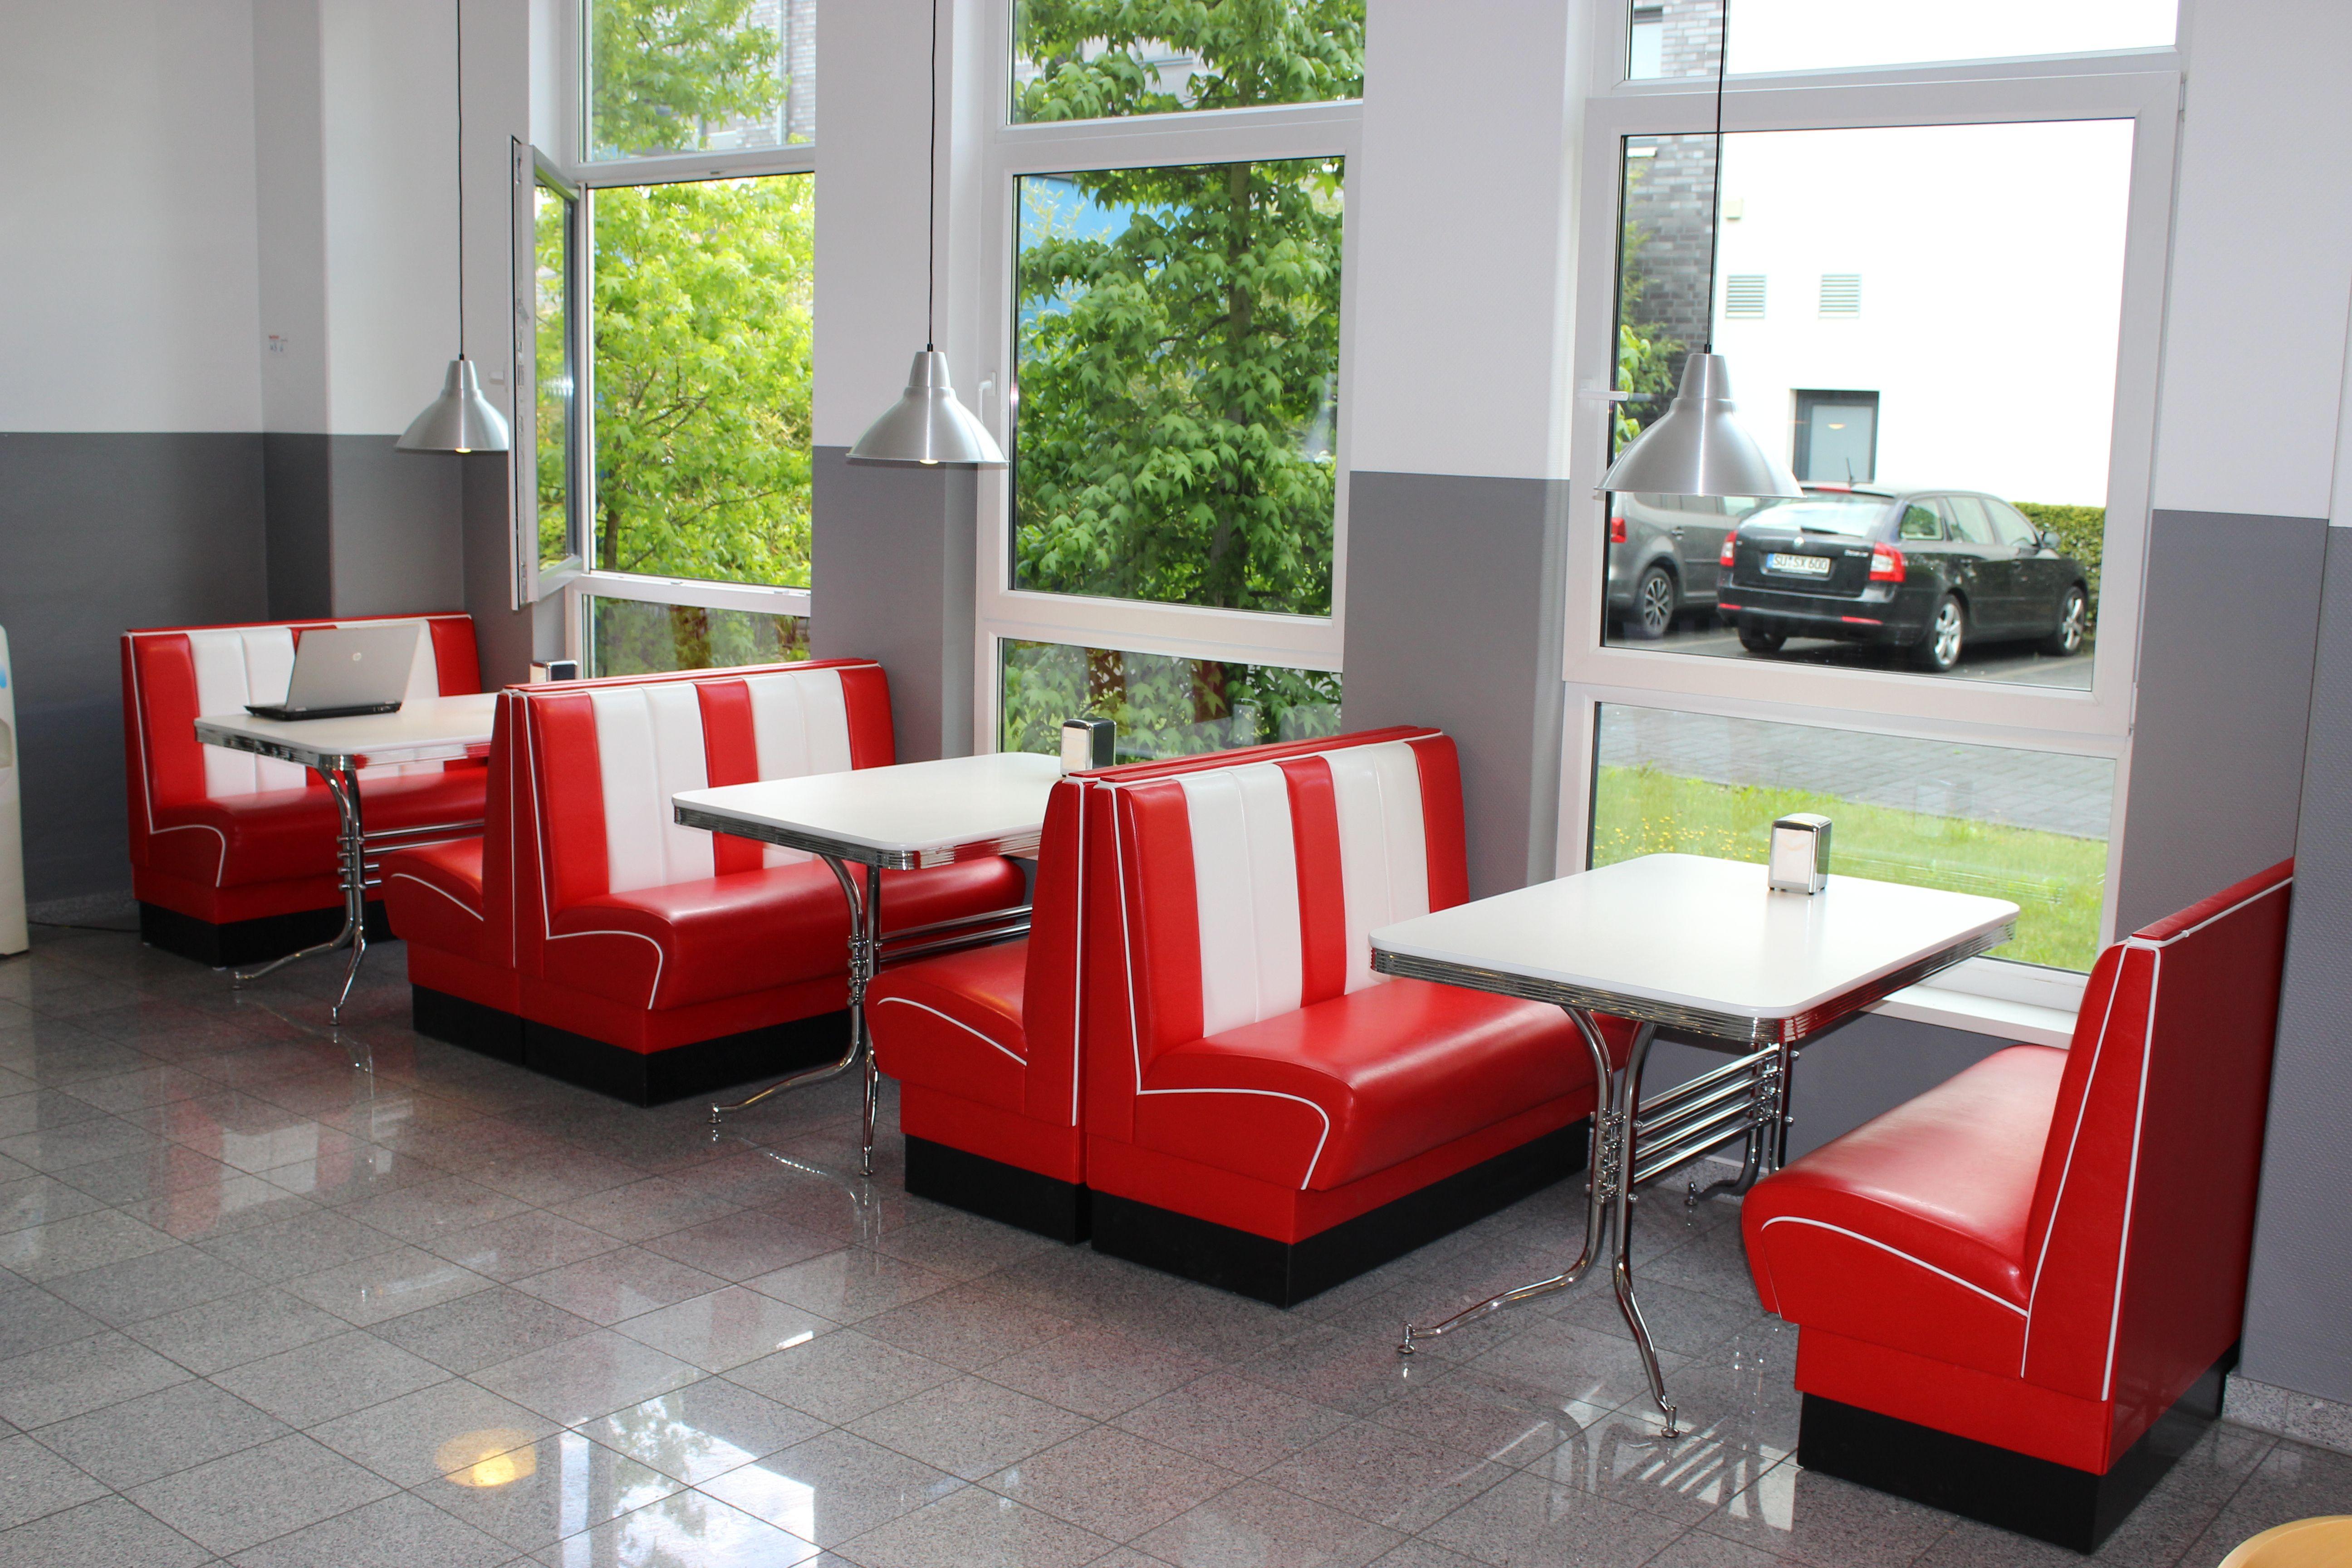 Kantinengestaltung Wohn design, Design